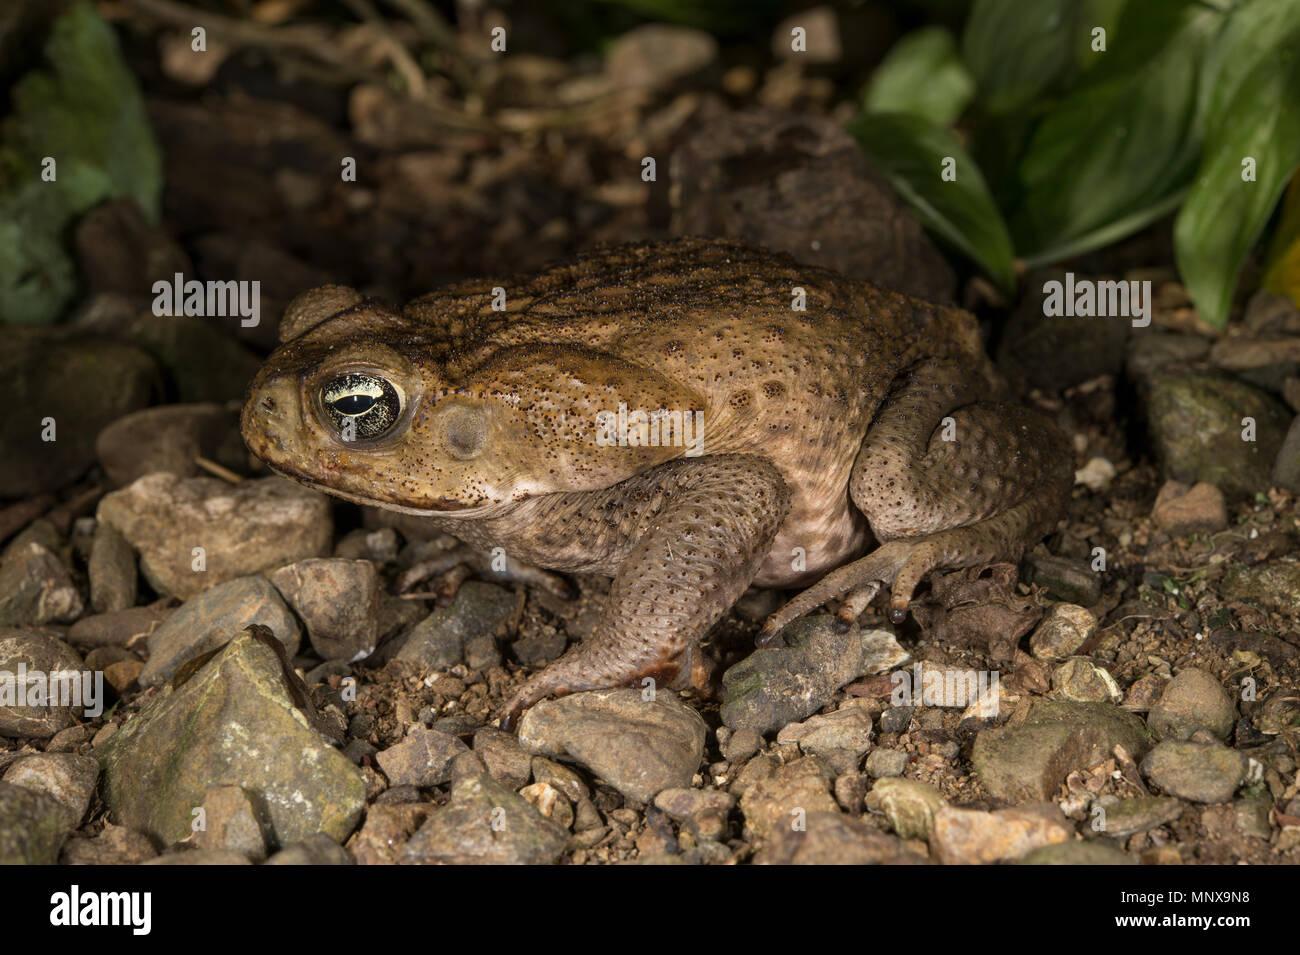 Cane Toad, Marine Toad, Rhinella marina, Bufonidae, Costa Rica - Stock Image